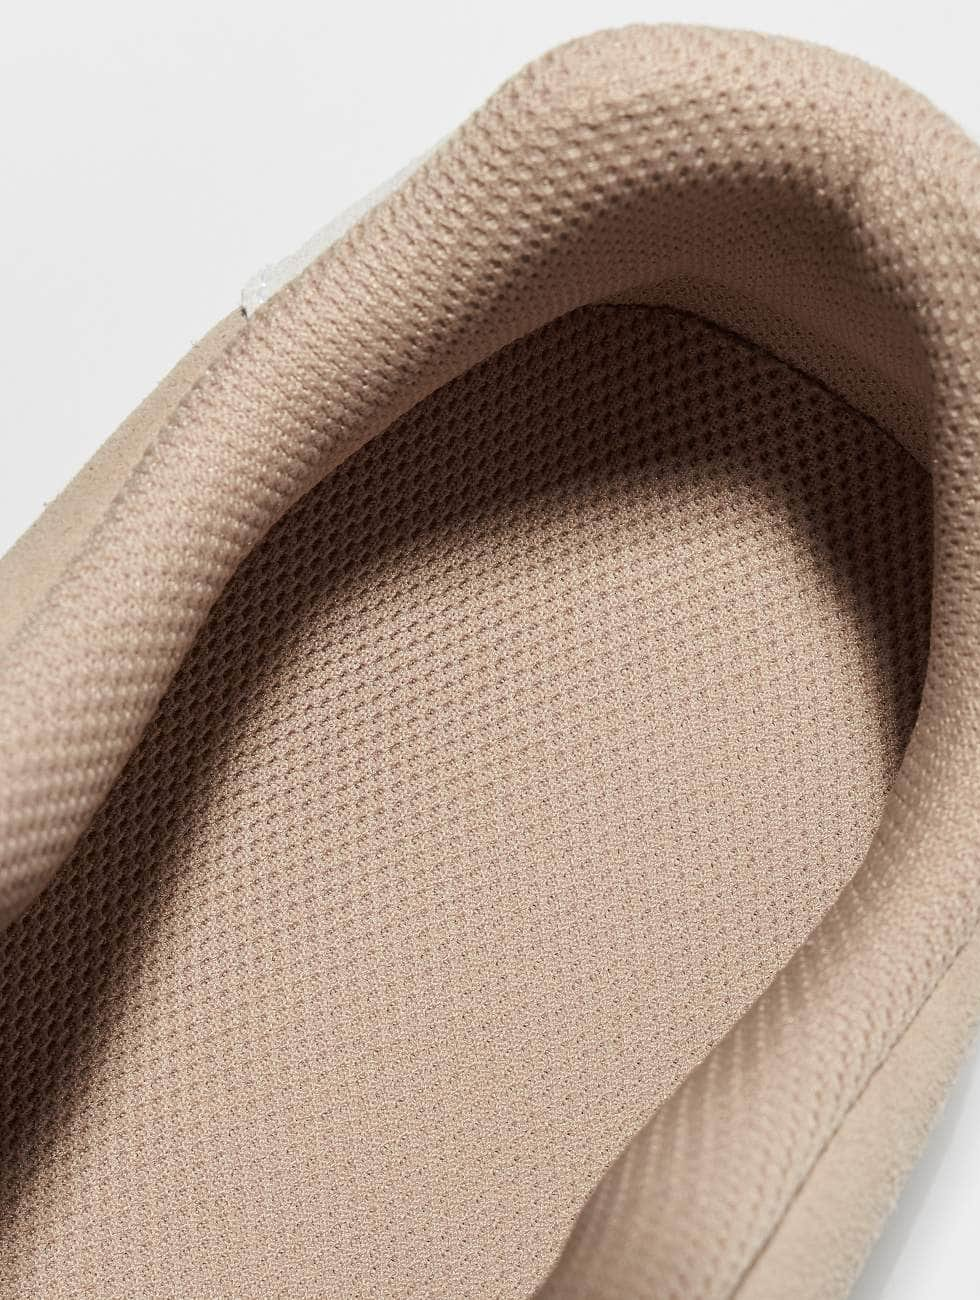 Scarpa Nike / Sneaker In Royale Beige Camoscio Corte 442 636 W0Vdb2k